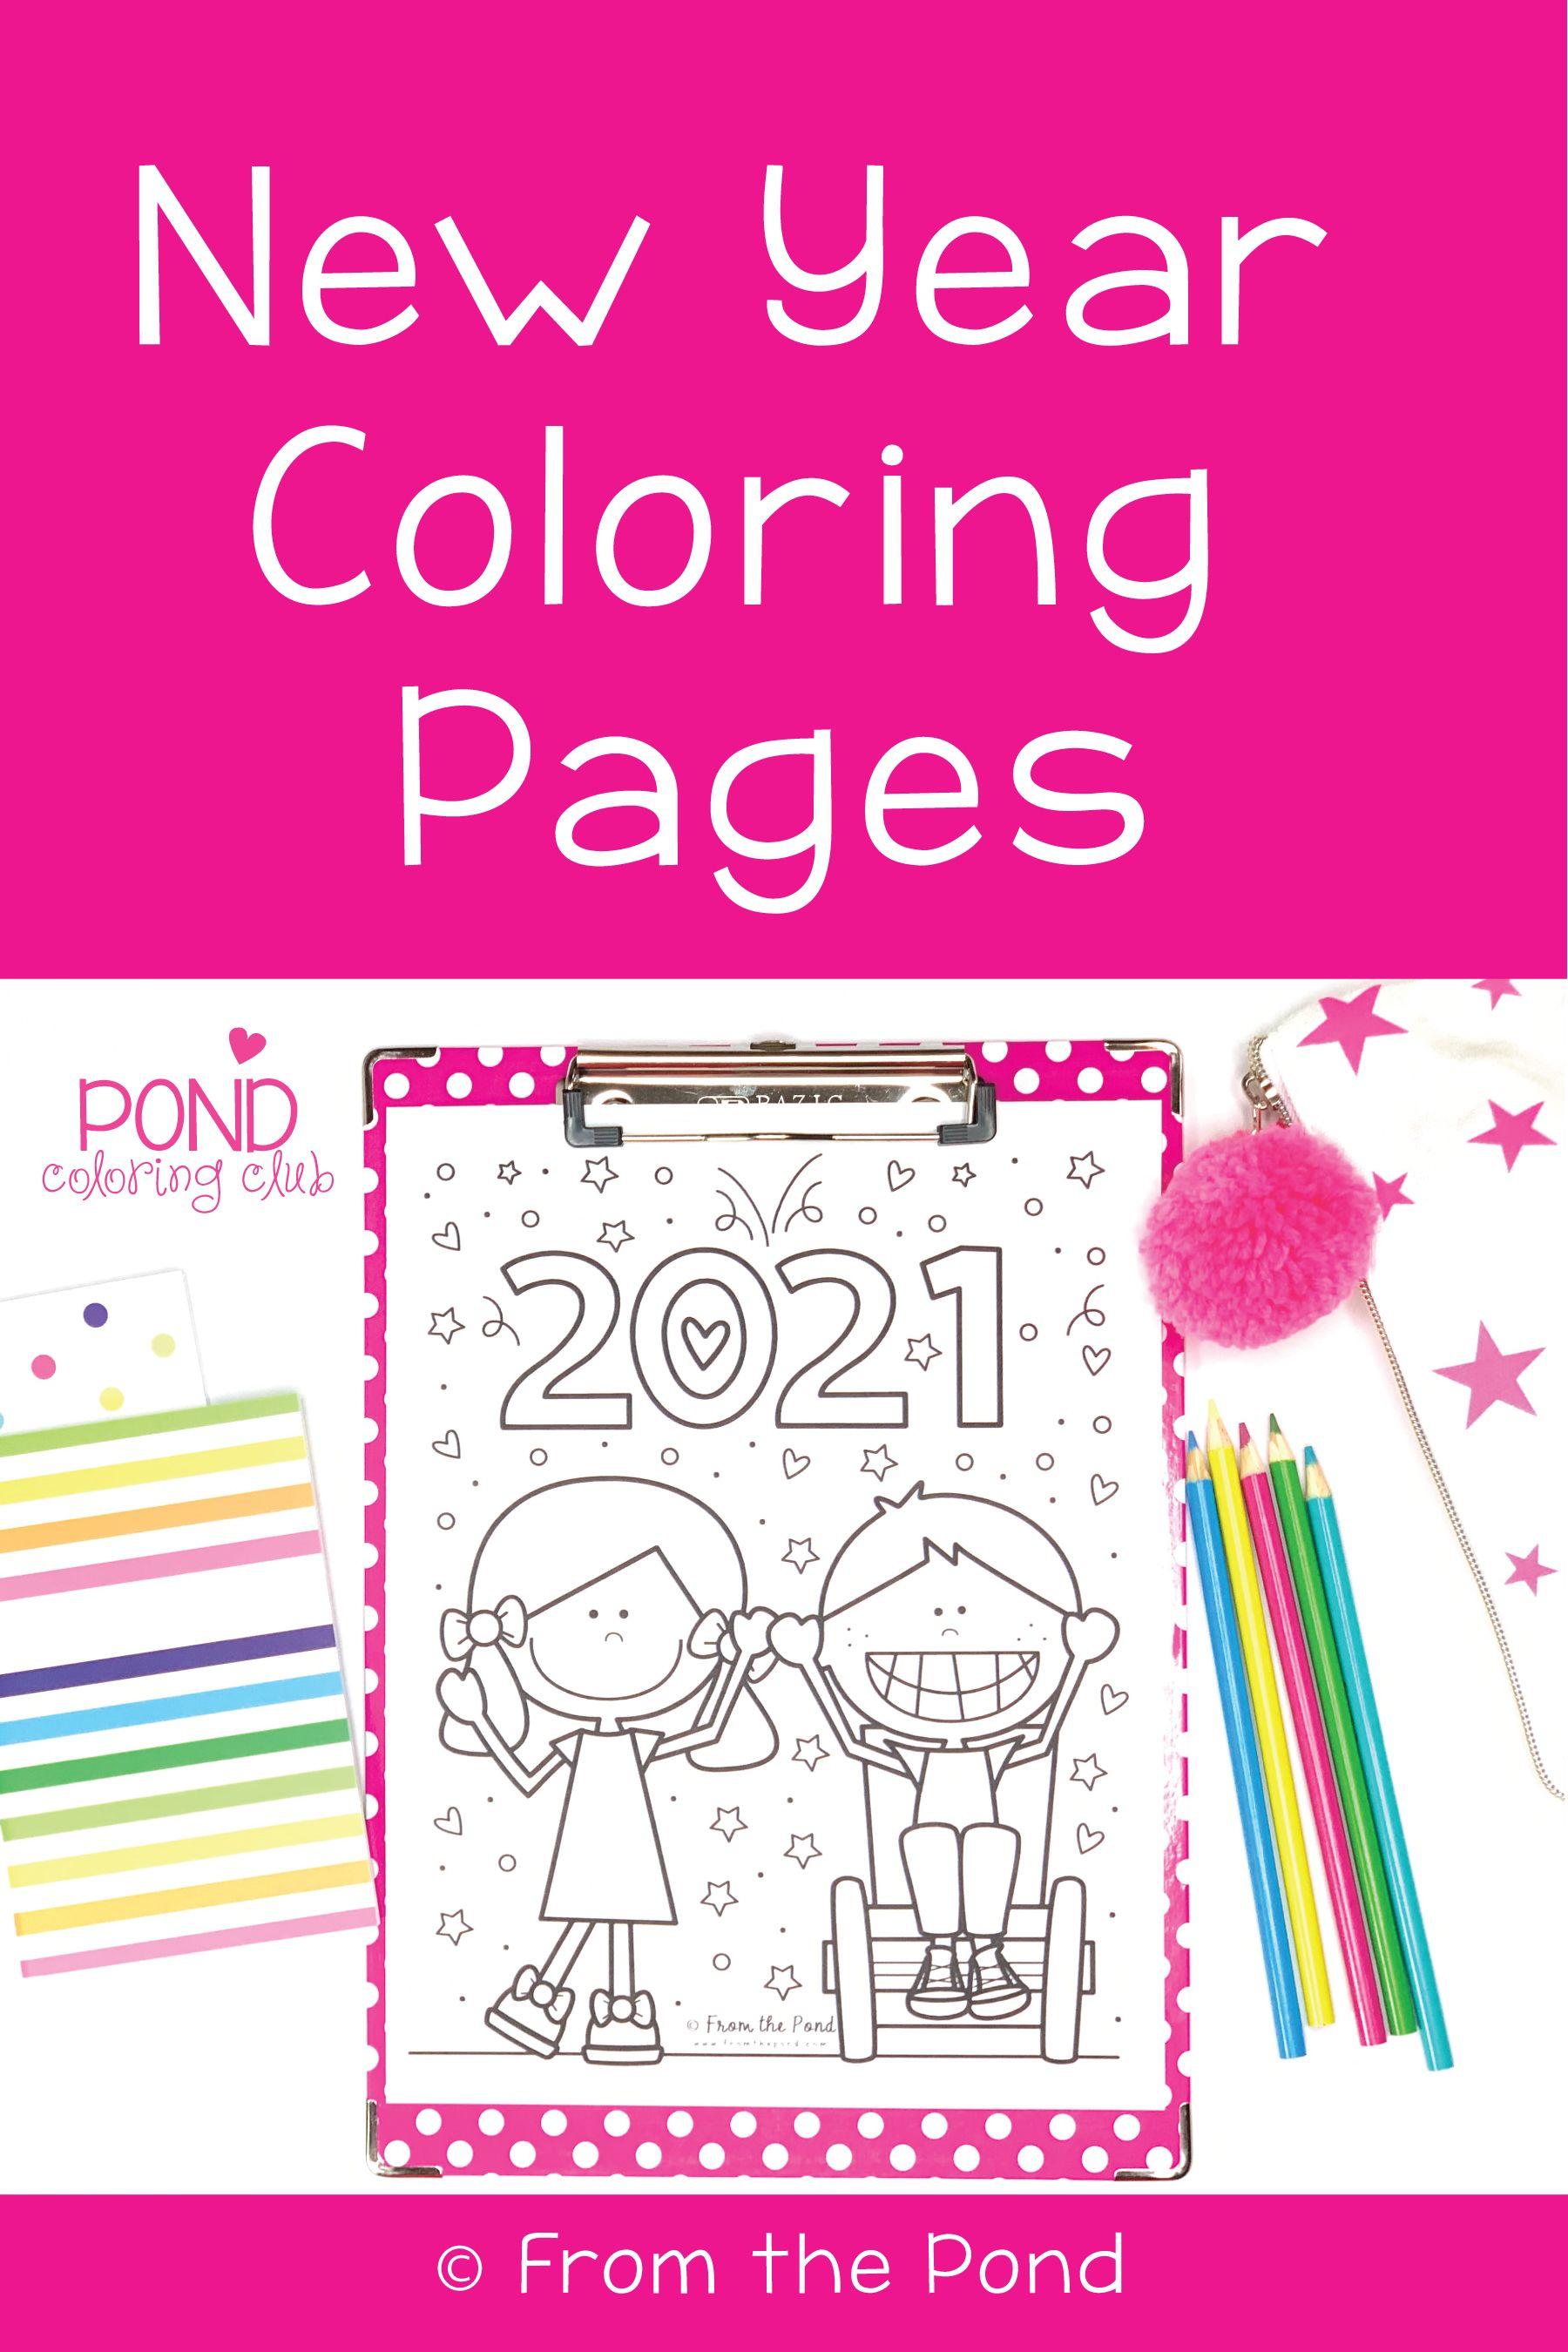 New Year Coloring Pages New Year Coloring Pages Coloring Pages Color Club [ 2700 x 1800 Pixel ]